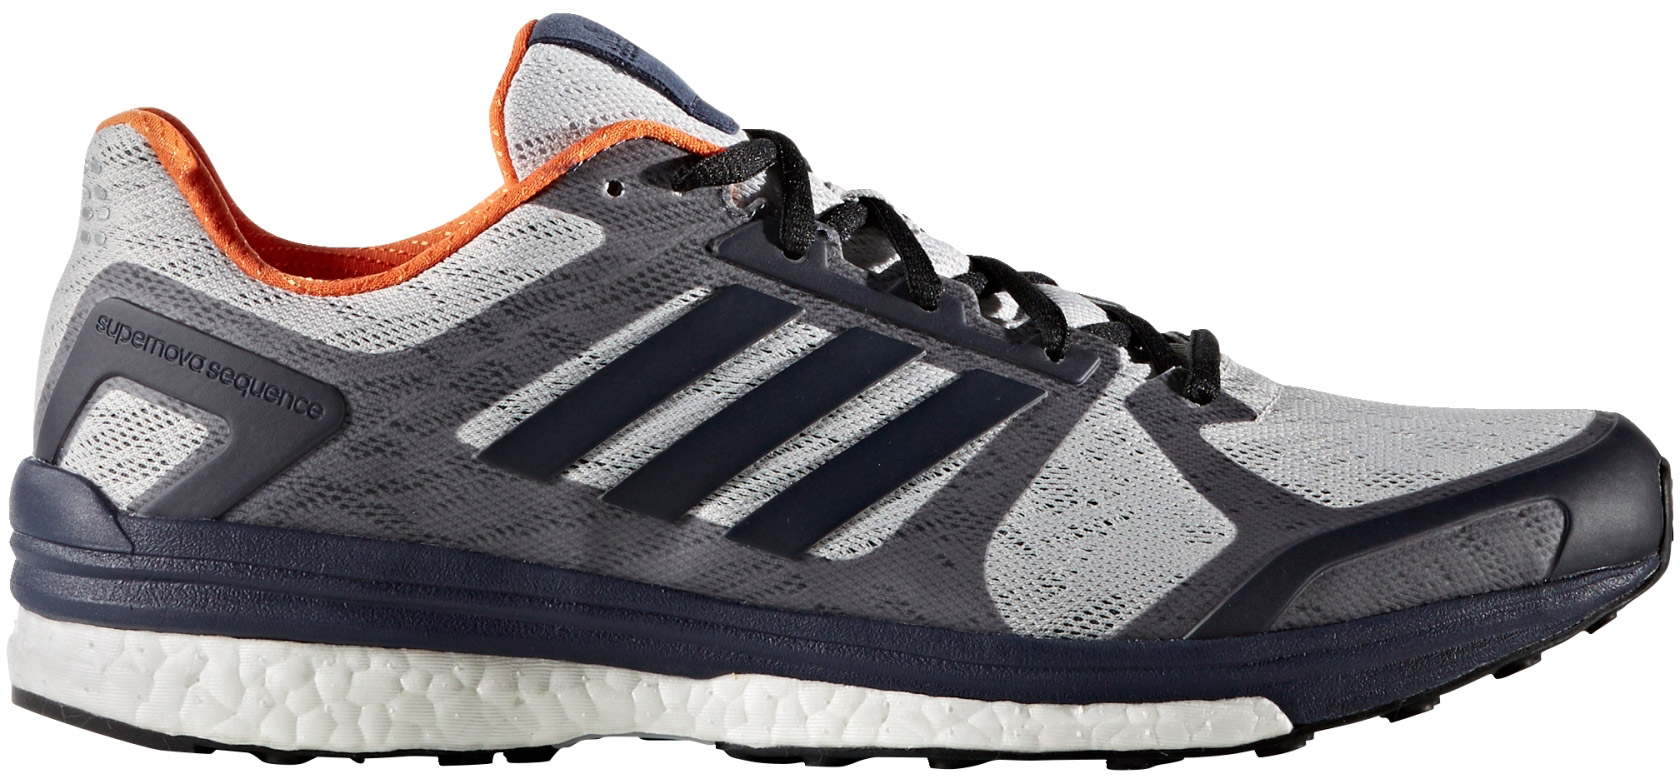 8caf58f51da3d adidas SUPERNOVA SEQUENCE 9 M. Men s running shoes